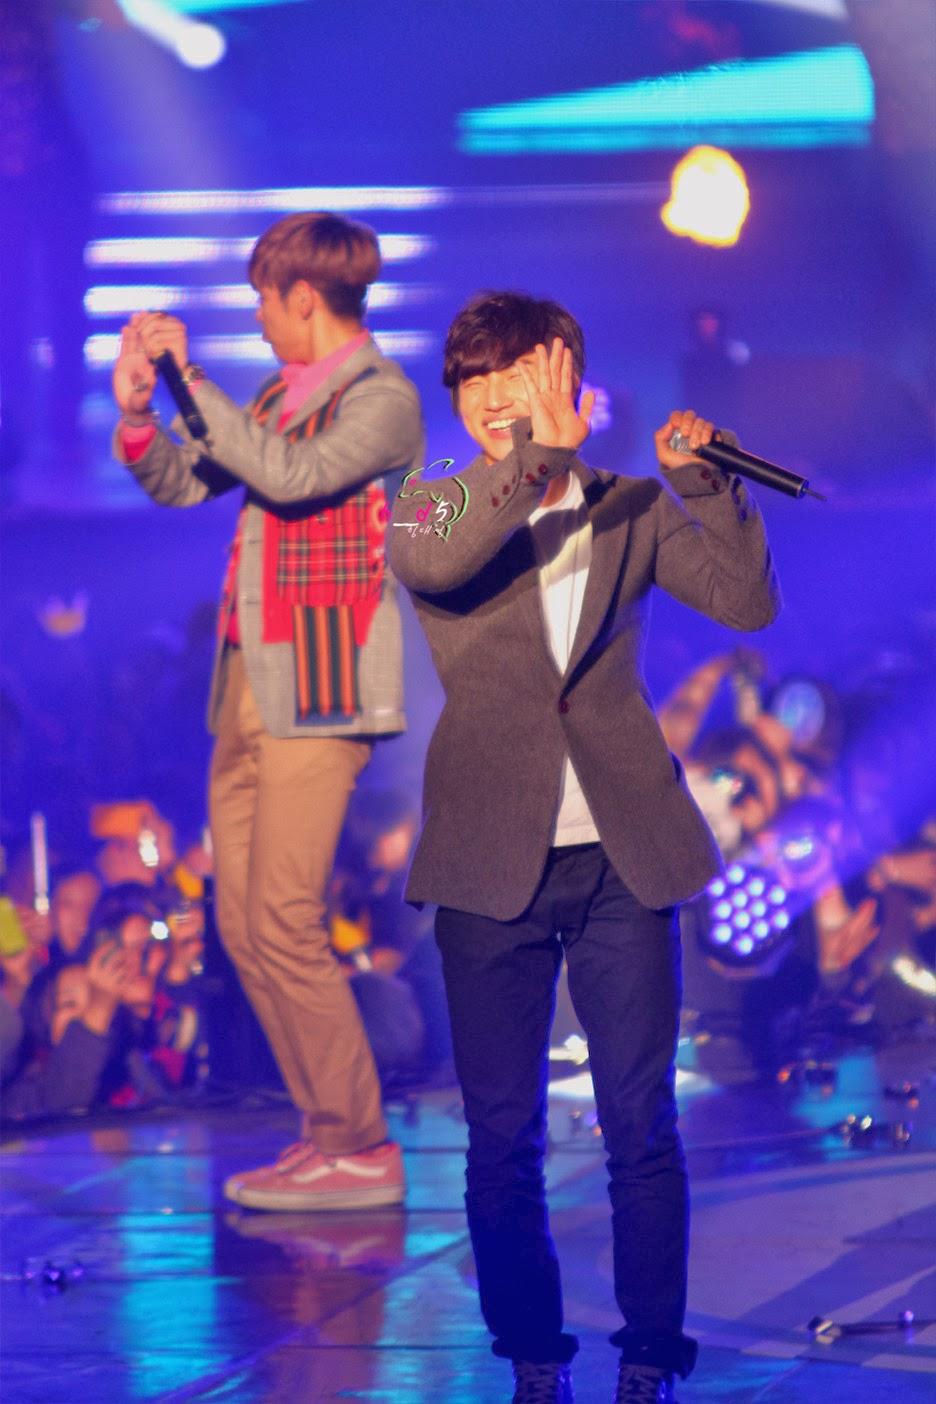 http://4.bp.blogspot.com/-RYC00qW943o/TvMAcrdIV7I/AAAAAAAAPMk/J8ys80LDcuE/s1600/Daesung_013.jpg